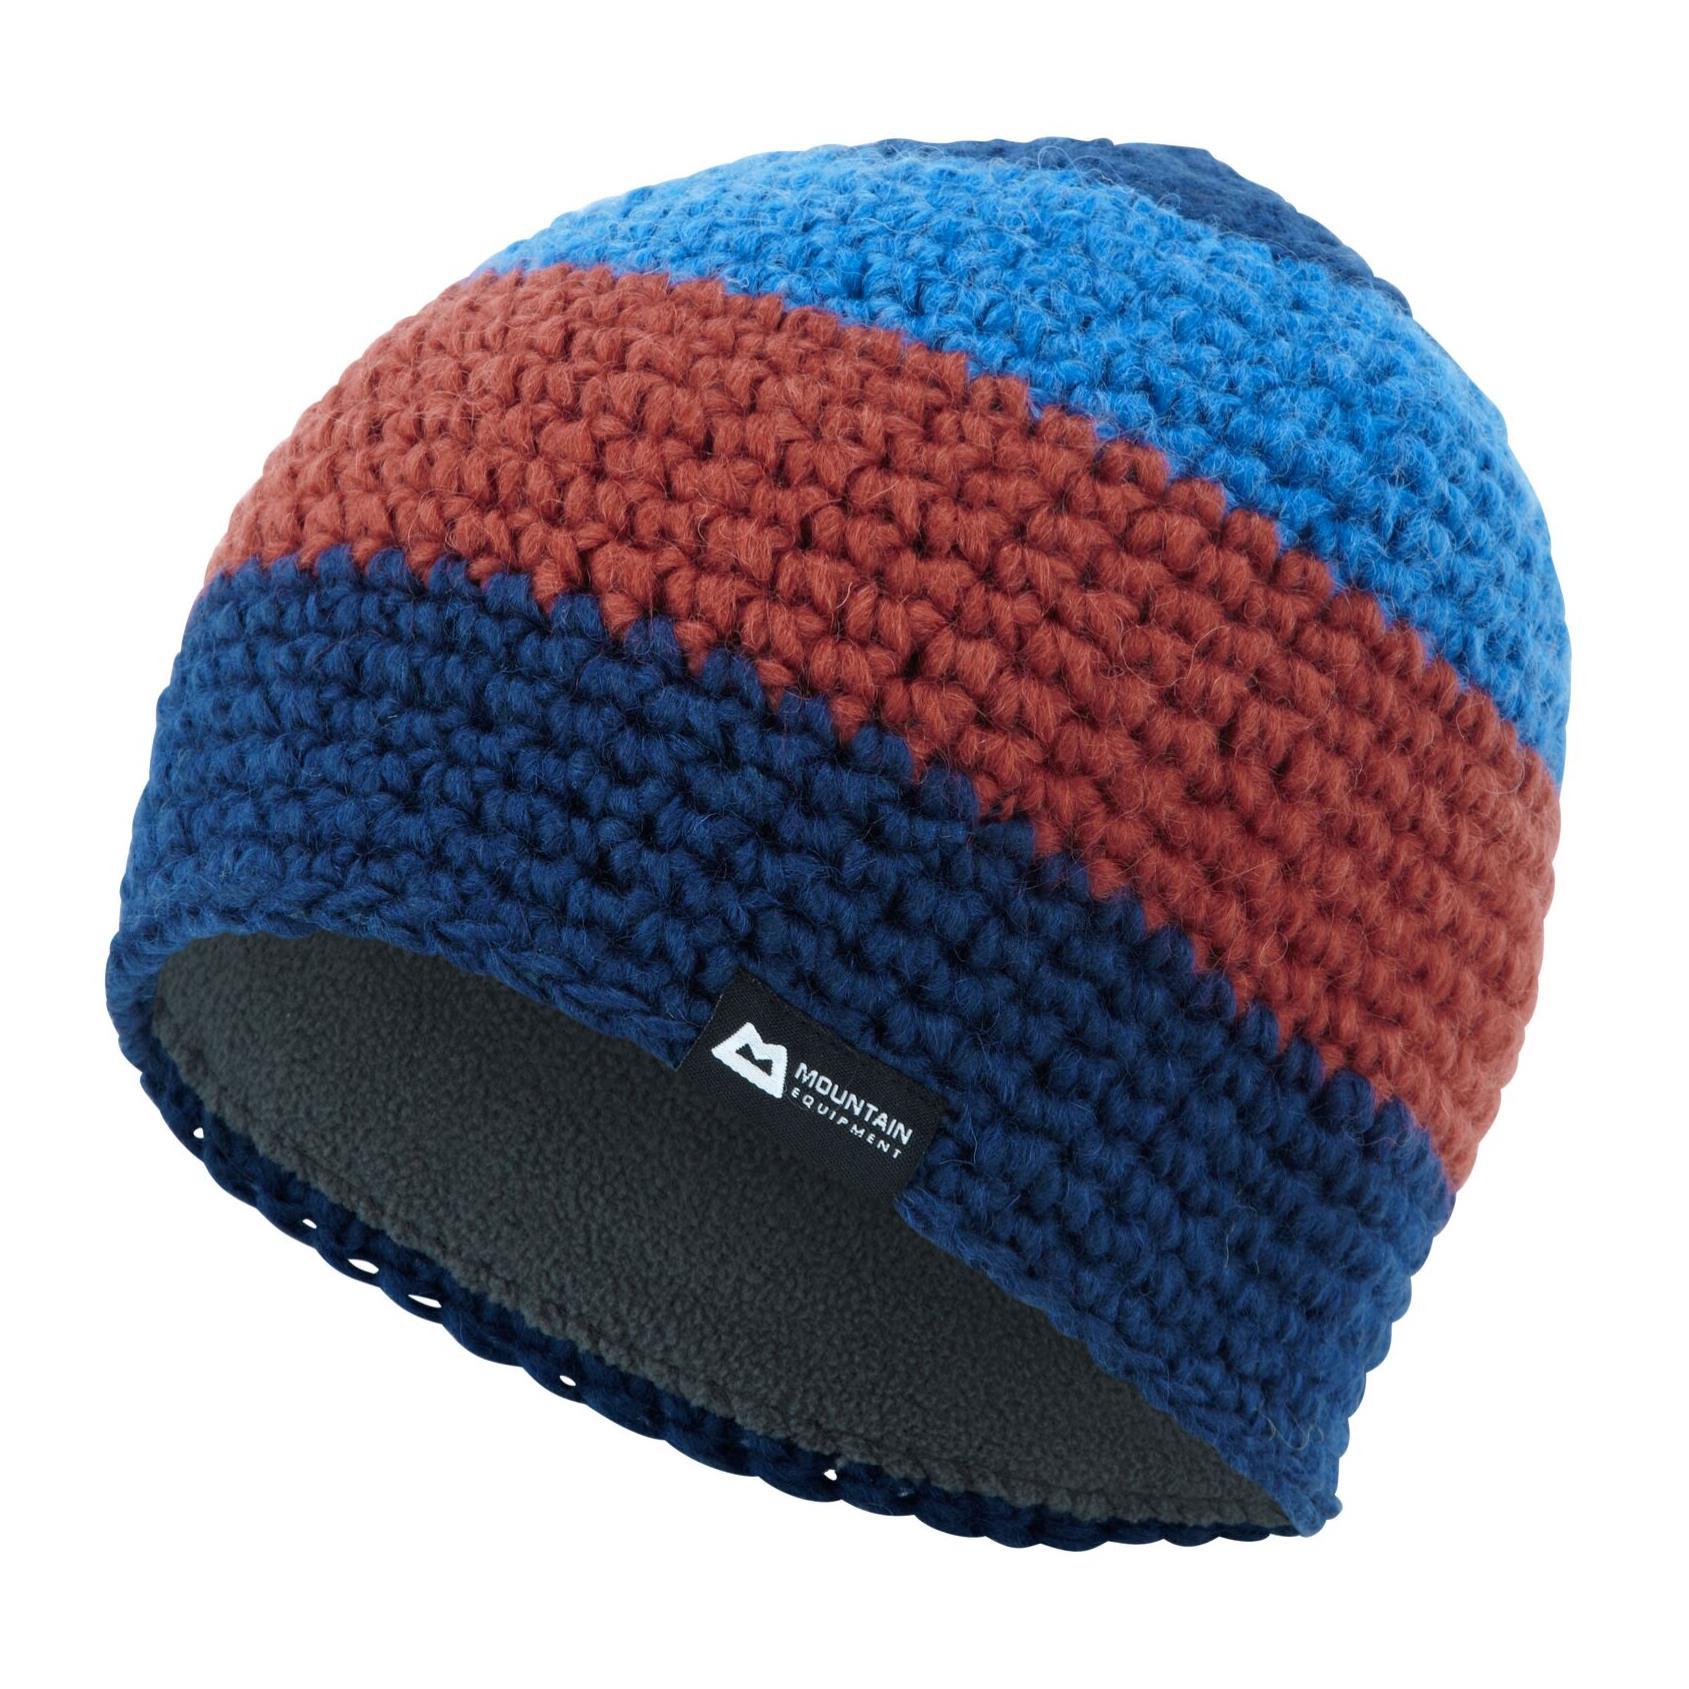 Mountain Equipment Flash Beanie Mütze blau/orange